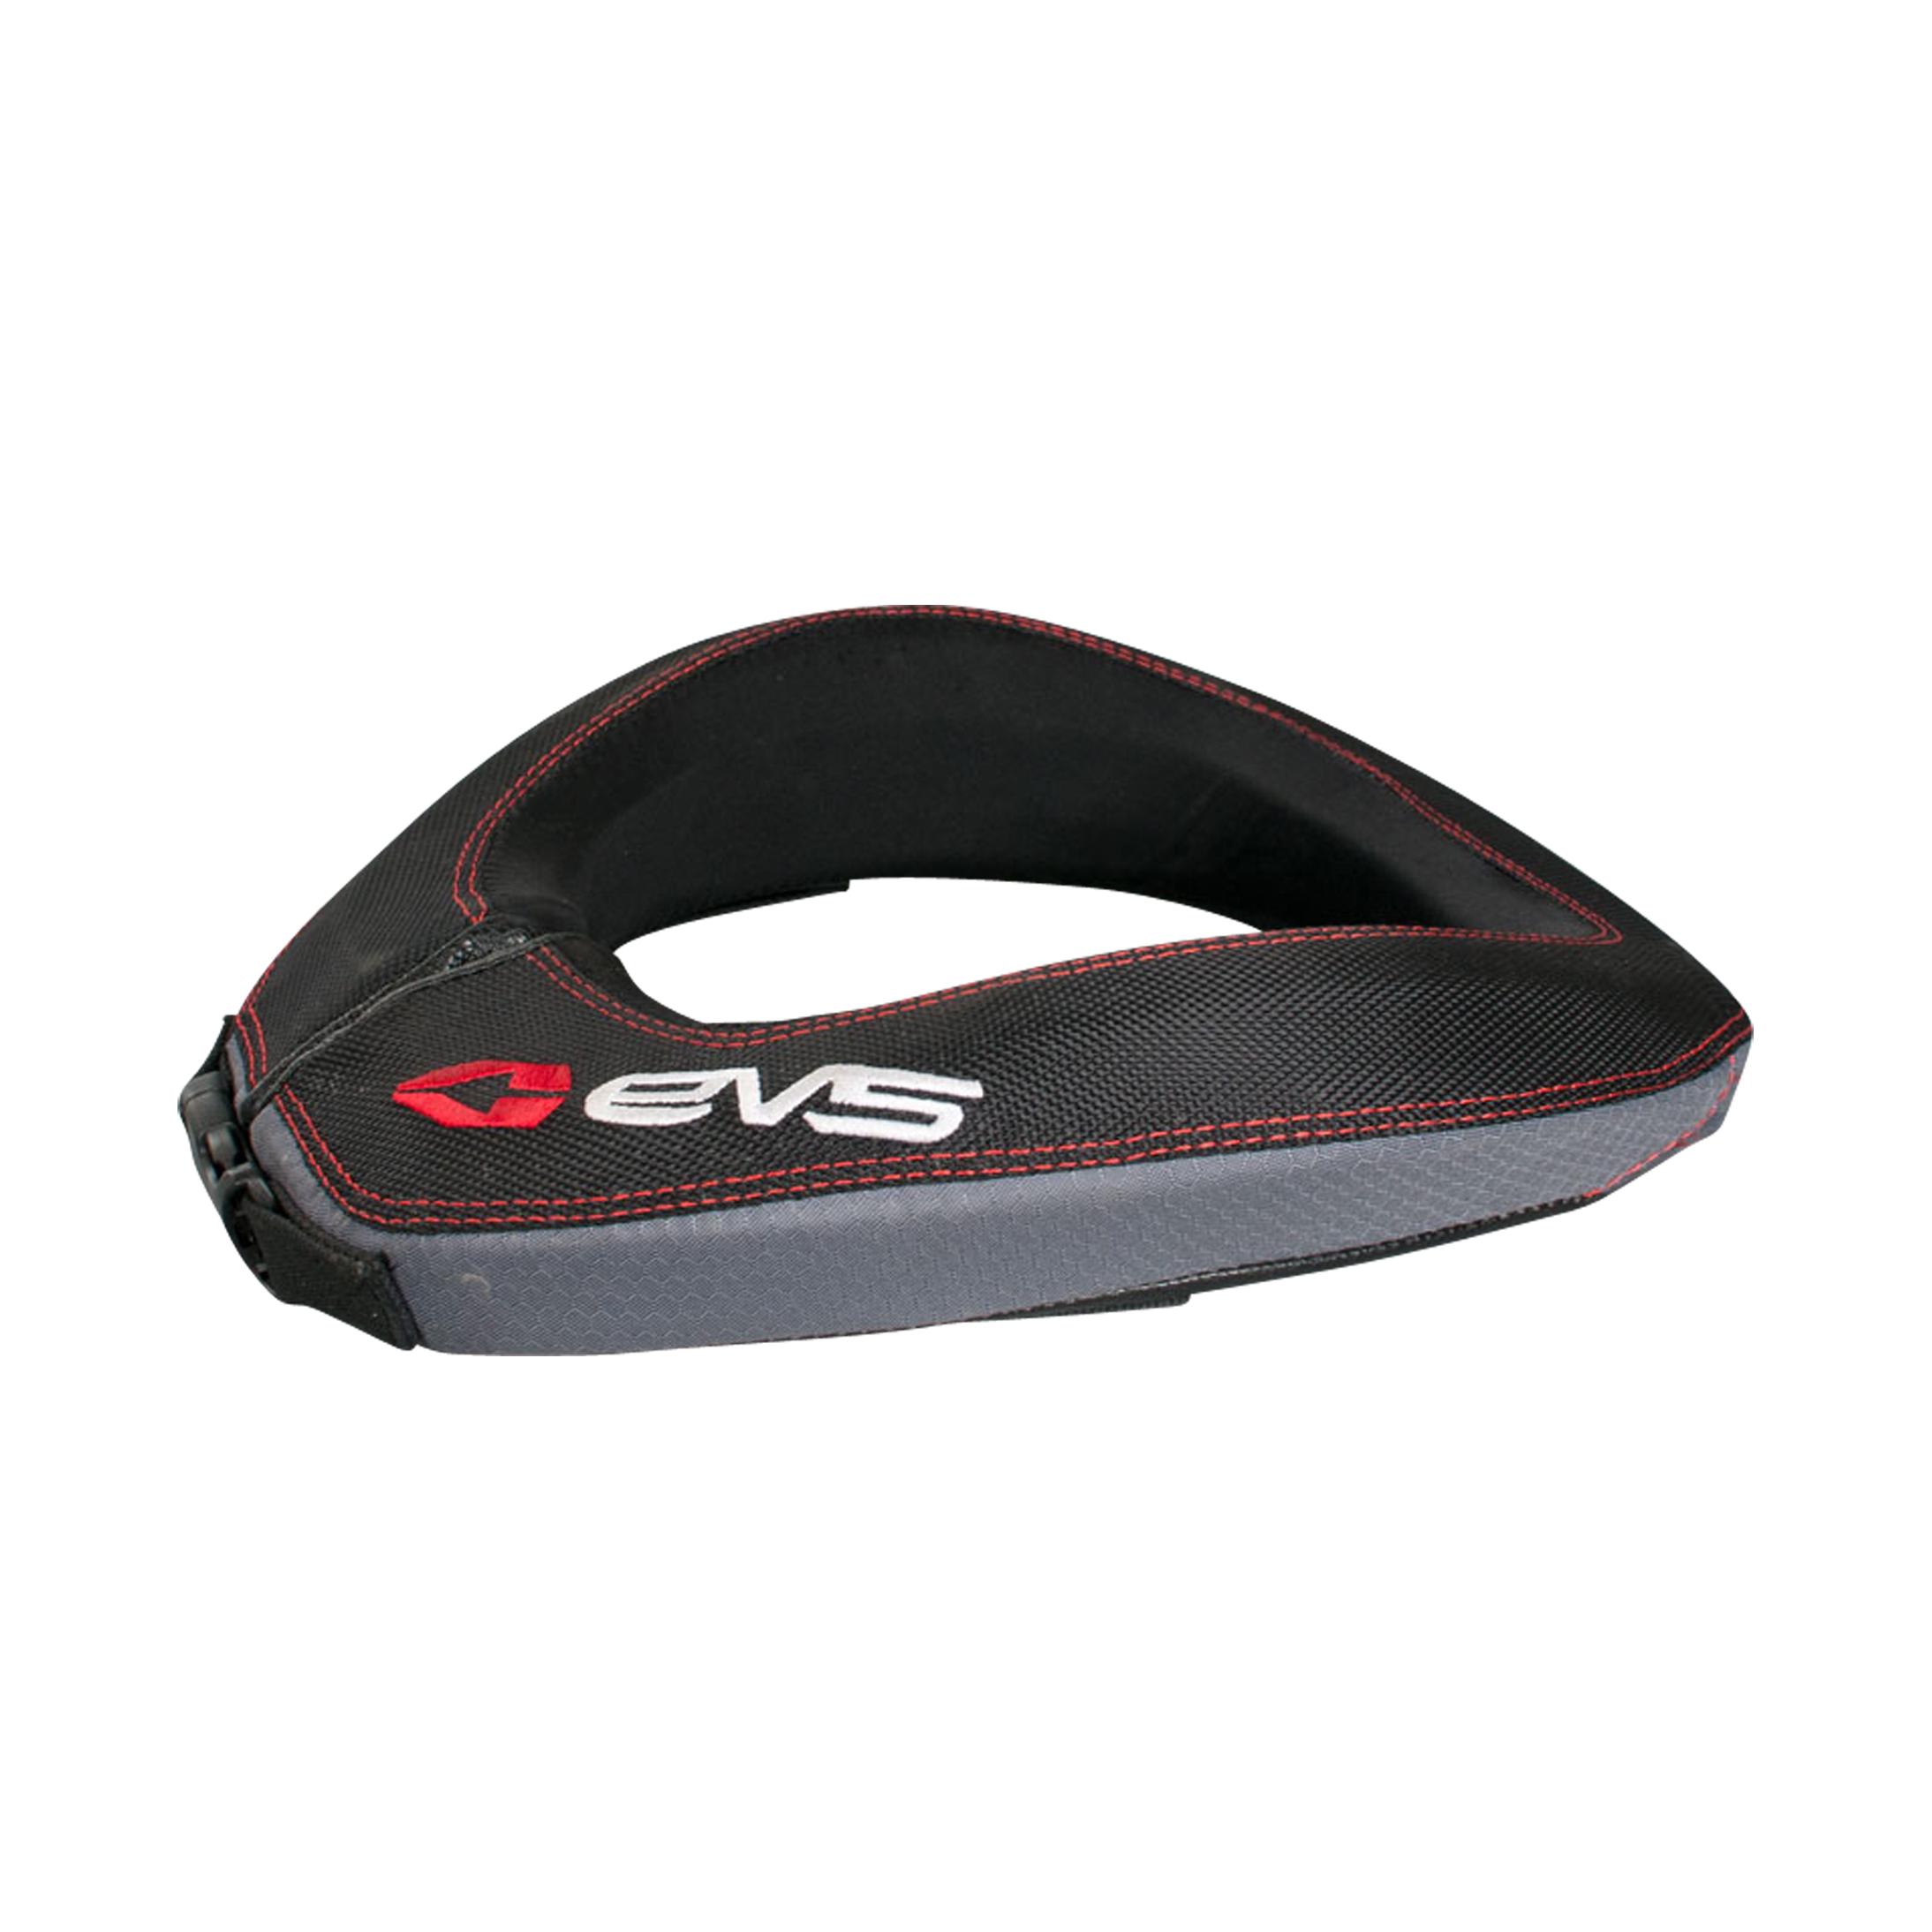 EVS Collare  RC2 Nero